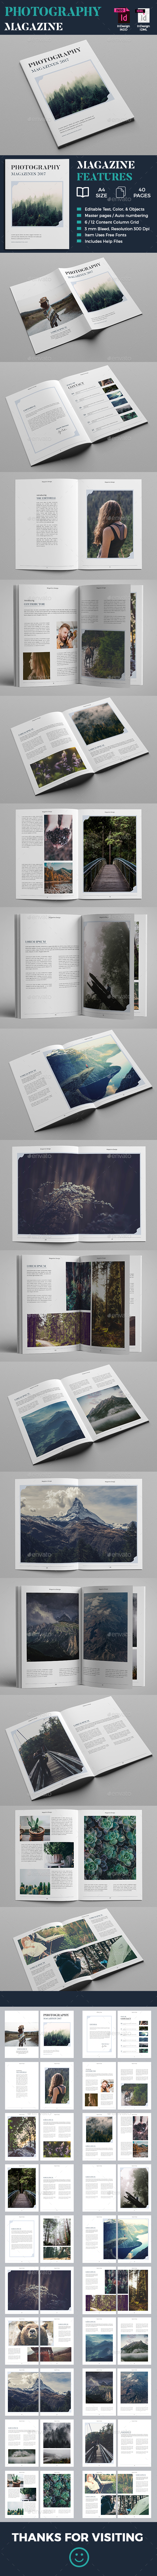 Photography Magazine - Magazines Print Templates